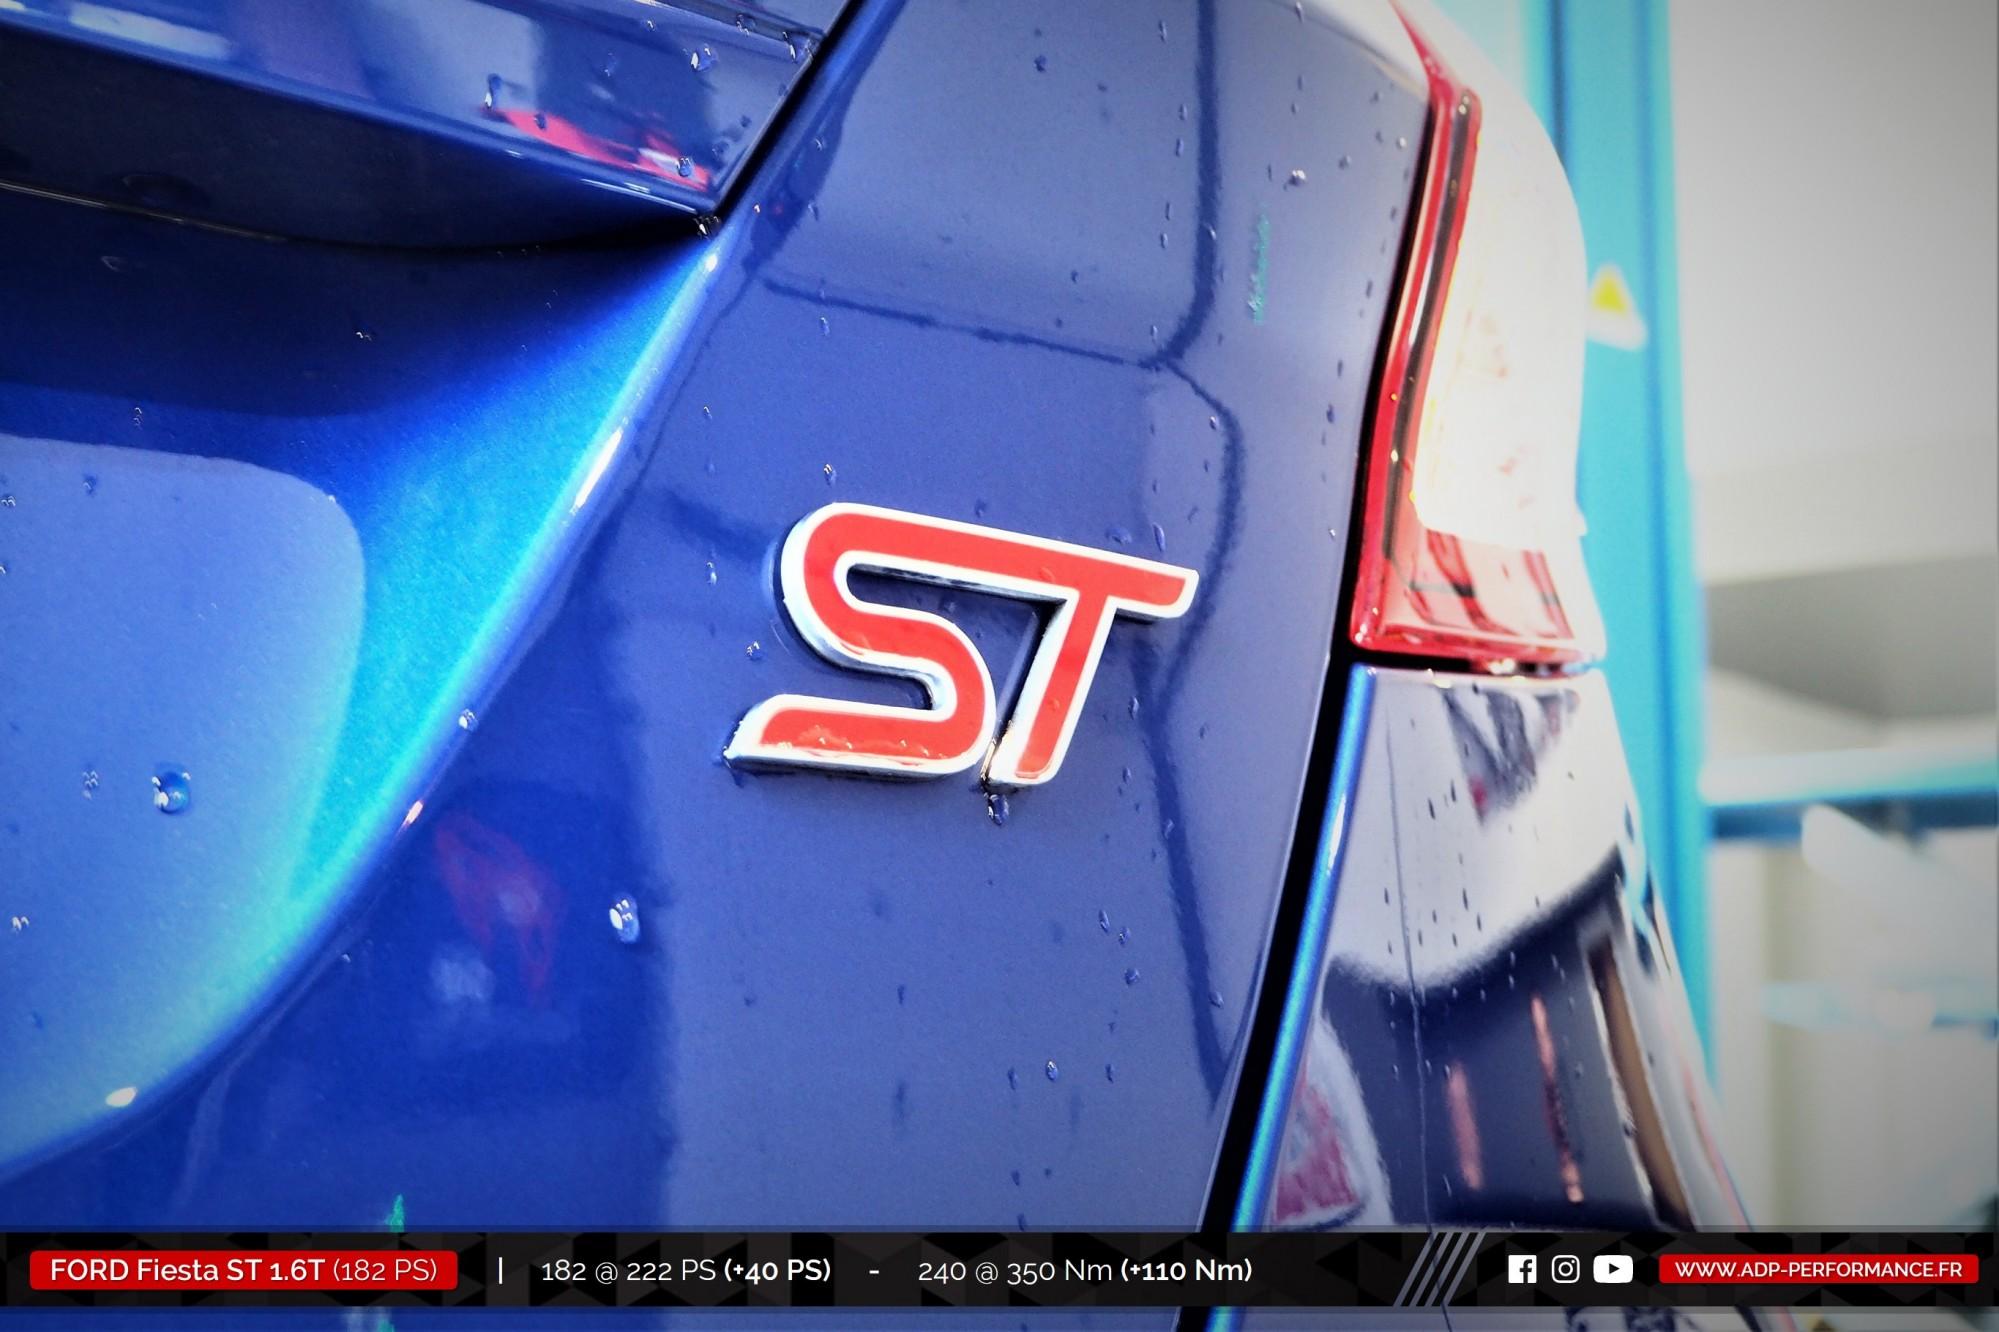 Reprogrammation moteur Nimes - Ford Fiesta ST 1.6T 182cv- ADP Performance